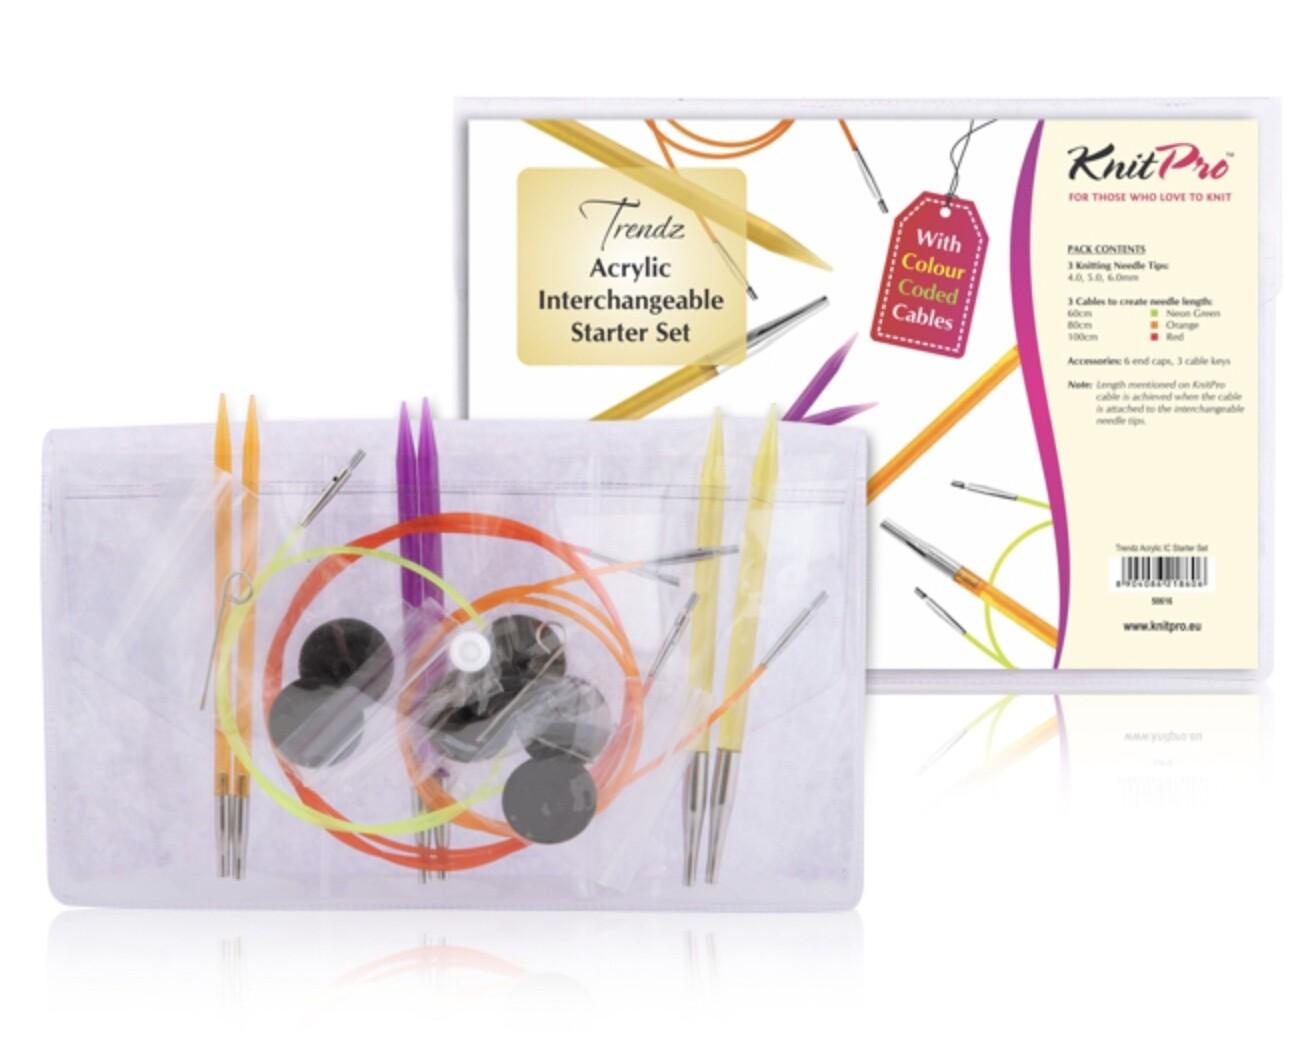 KnitPro Spectra Trendz starter kit knitting needles